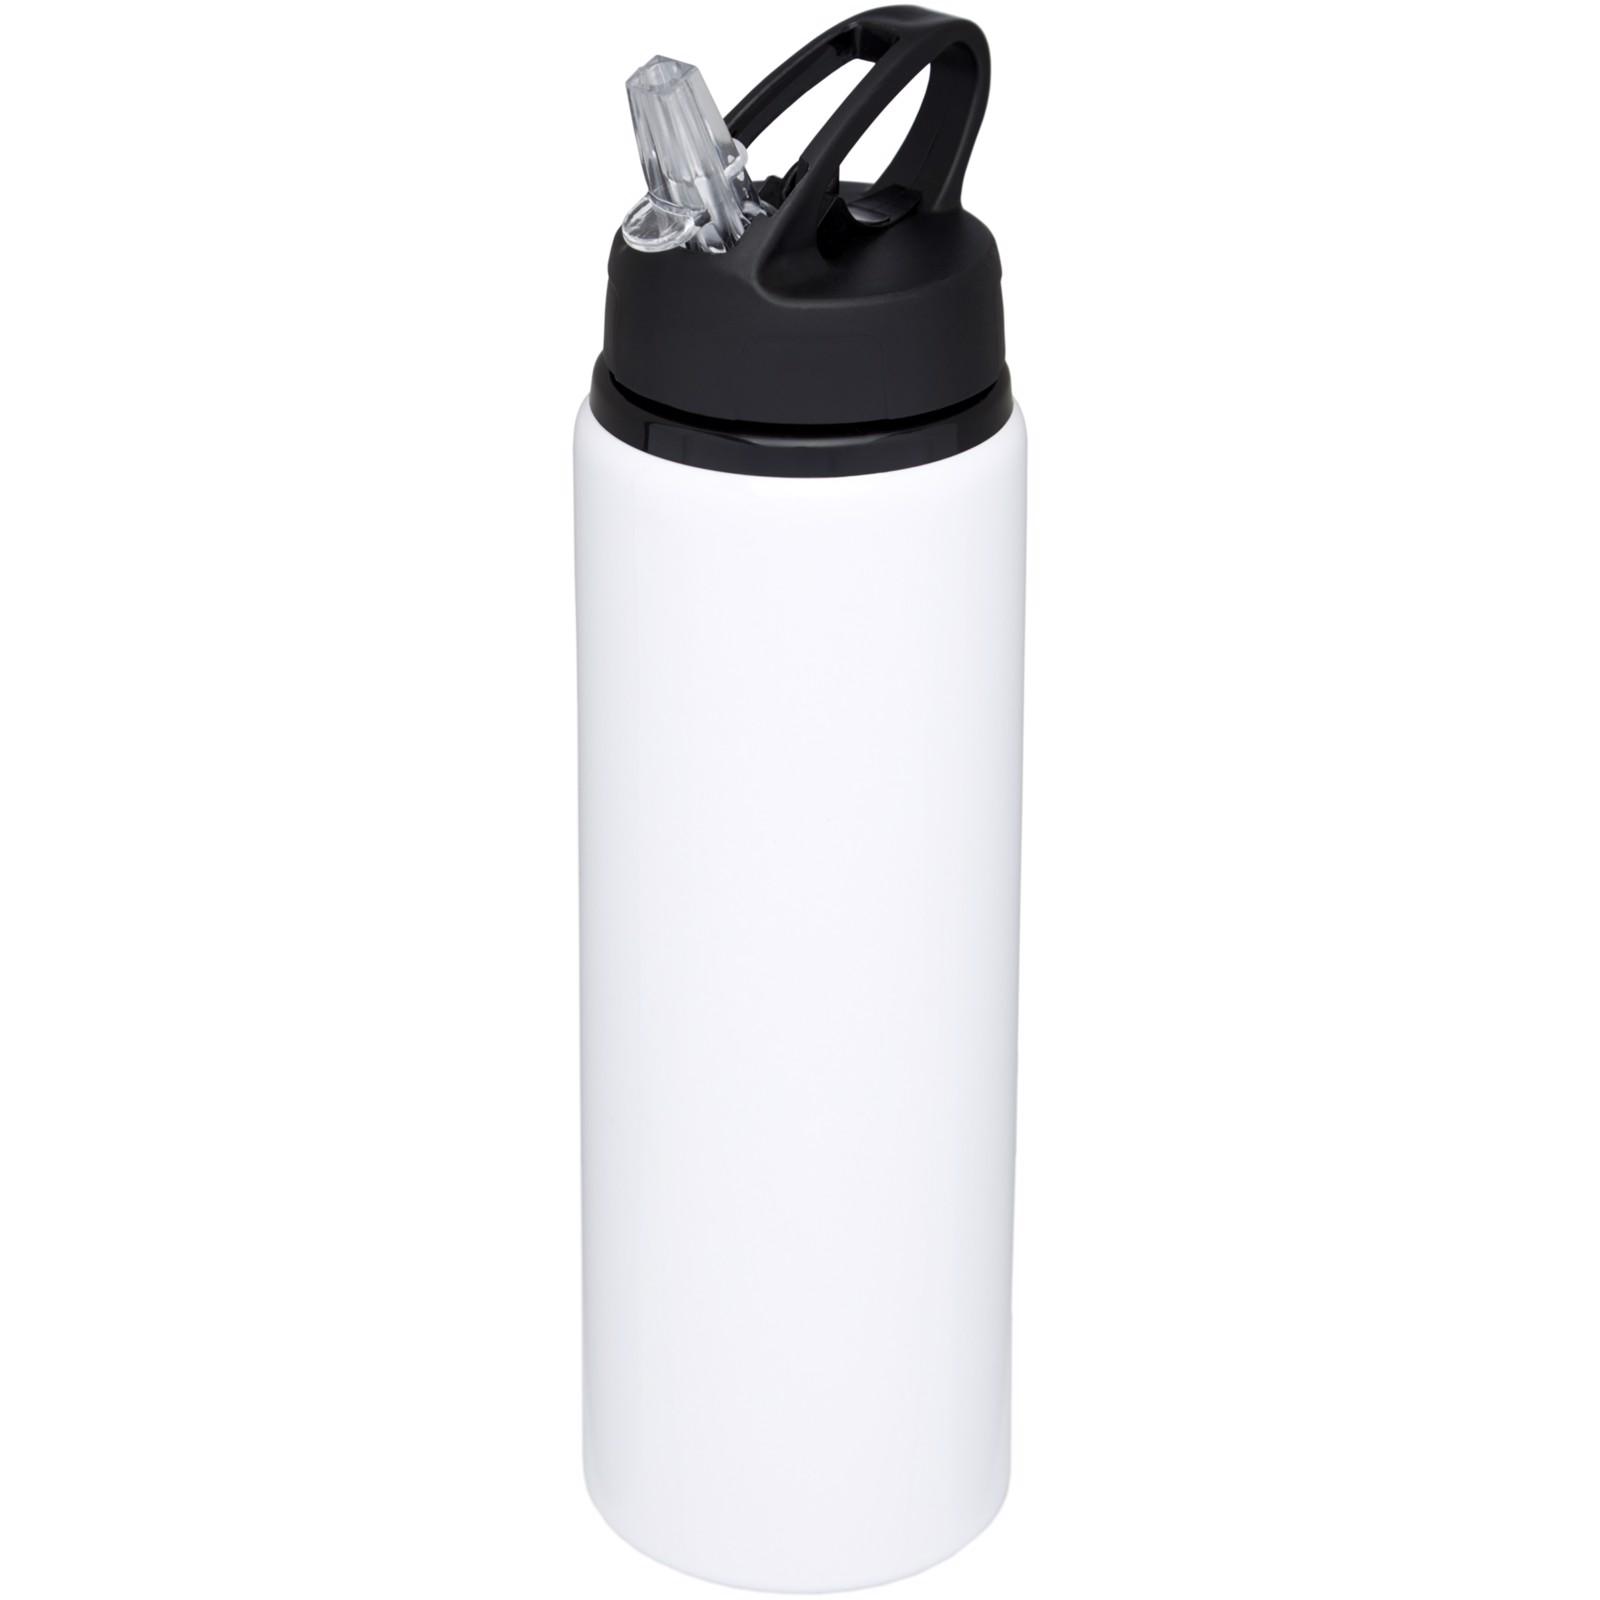 Fitz 800ml sportovní láhev - Bílá